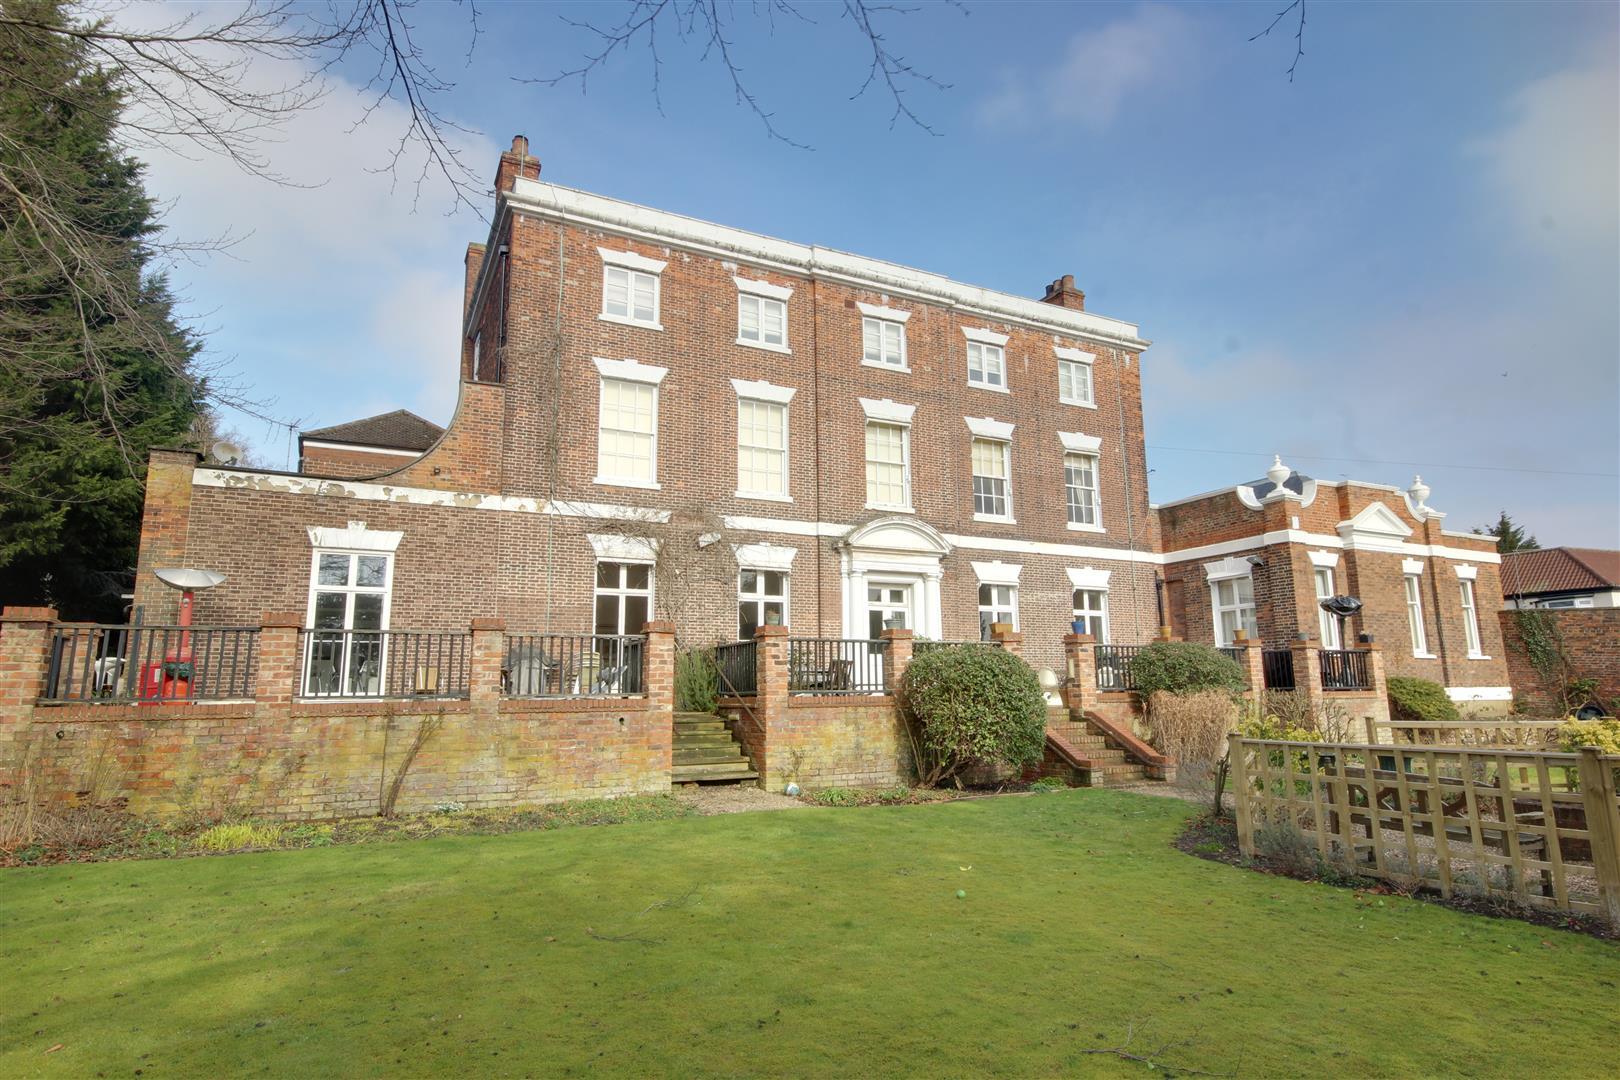 Apt 2 The Manor House, North Ferriby, Apt 2, HU14 3JR